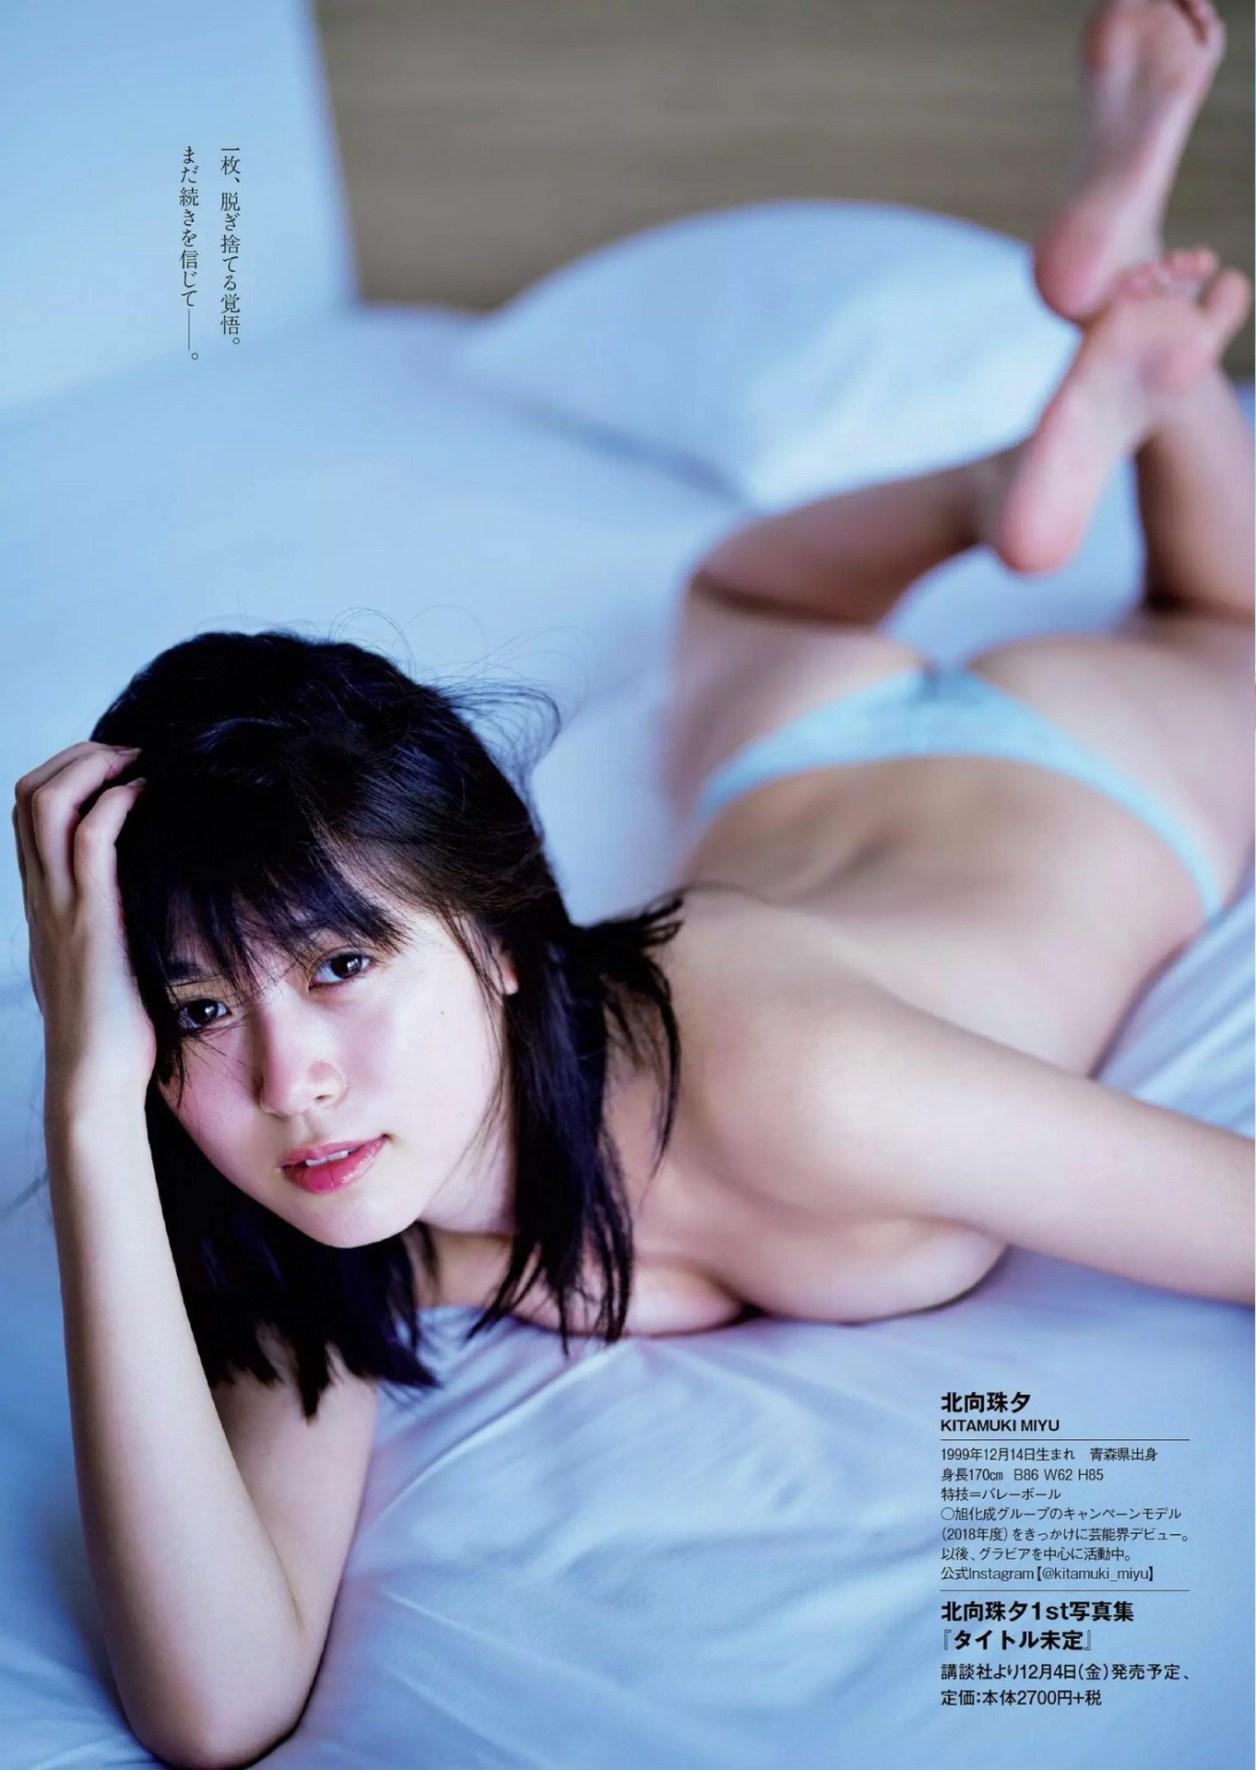 Weekly-Playboy-2020-43-Kitamuki-Mayu-0093